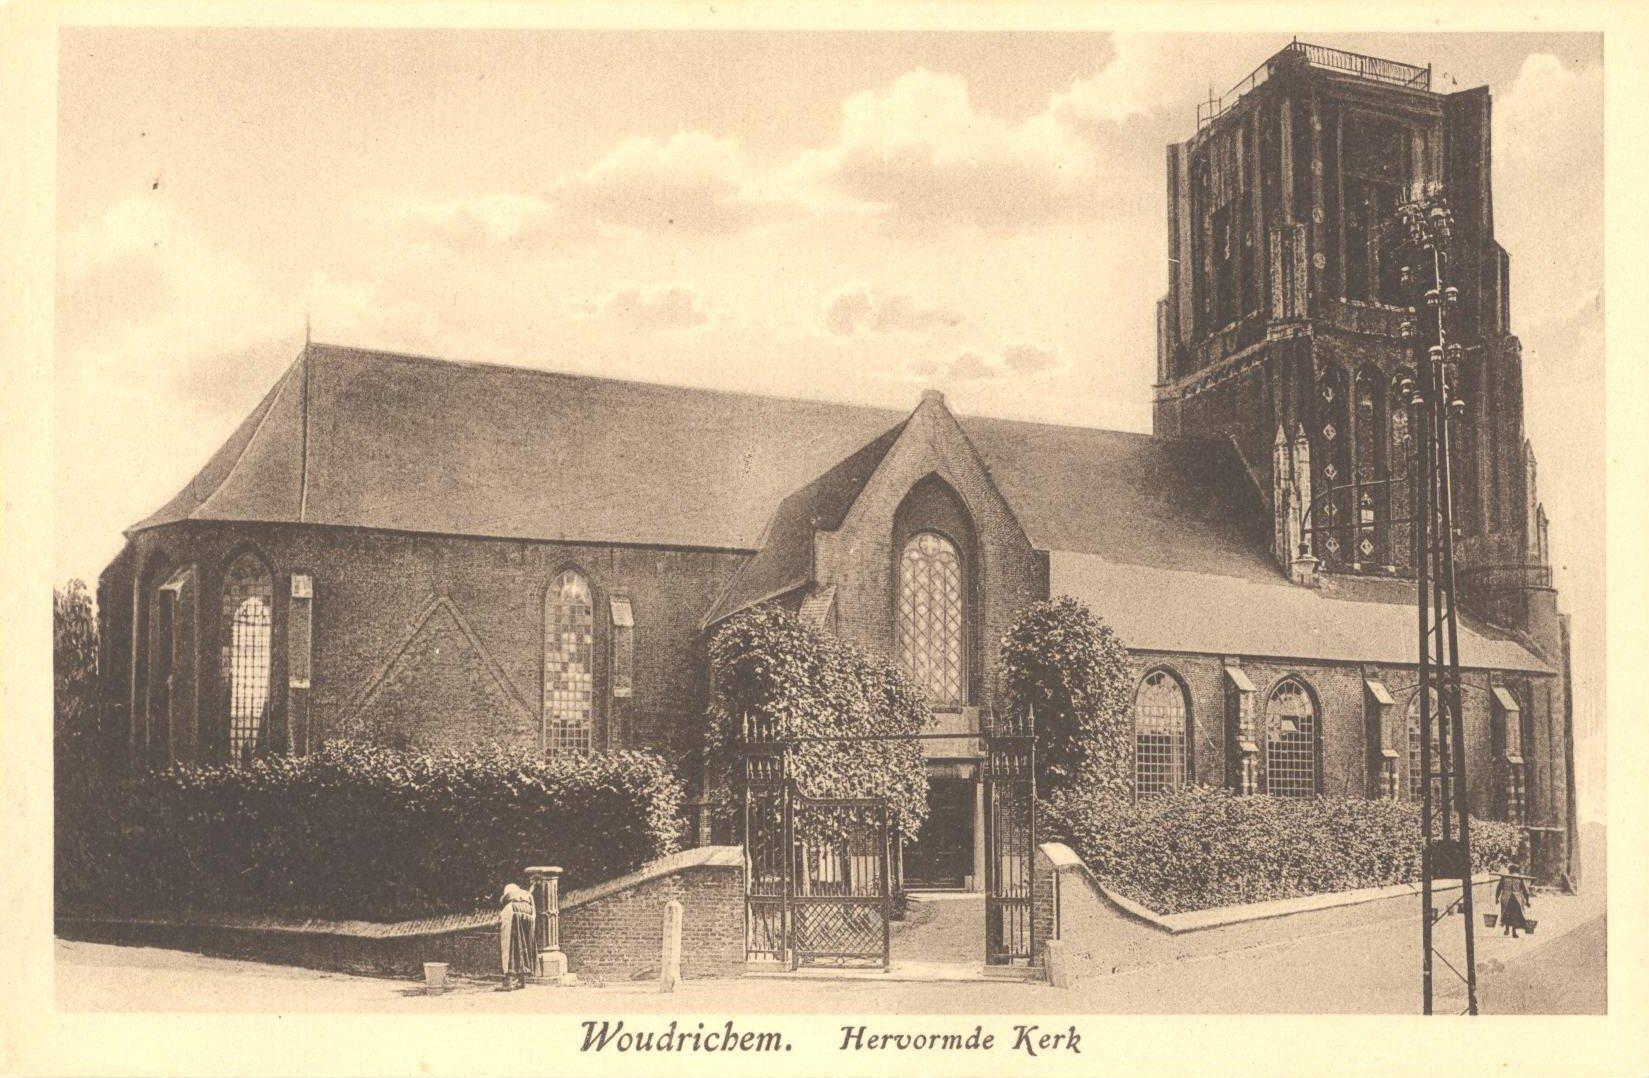 031 KERK -- (052) Hervormde Kerk